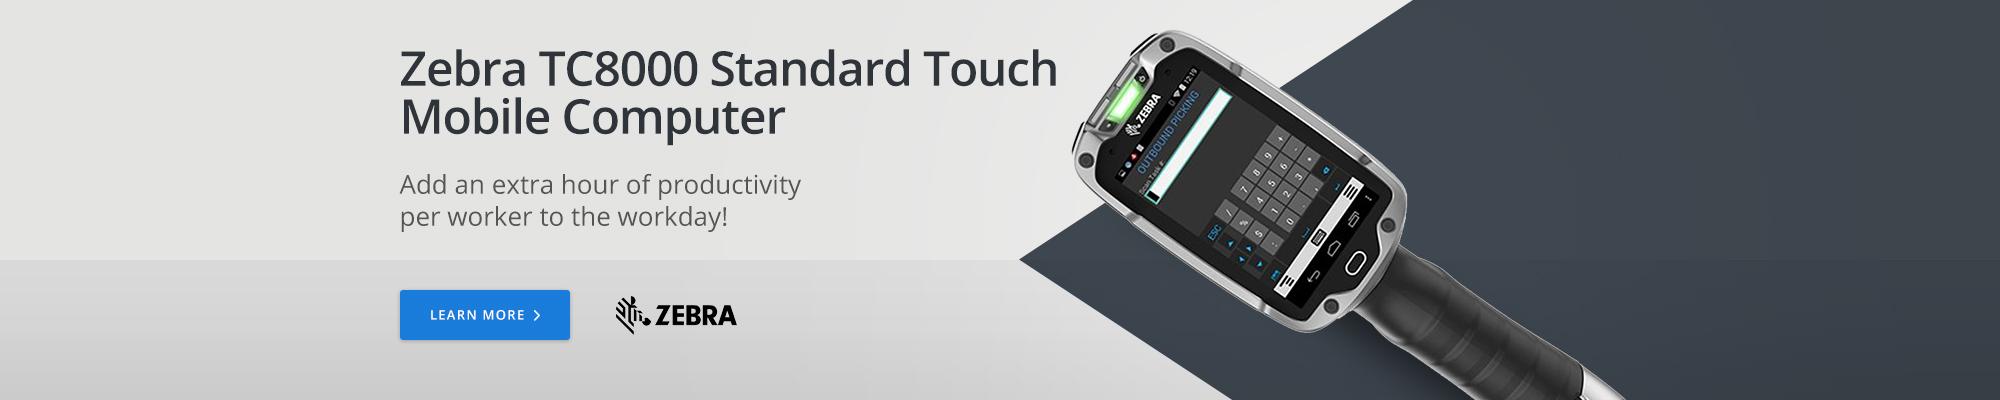 Zebra TC8000 Standard Touch Mobile Computer